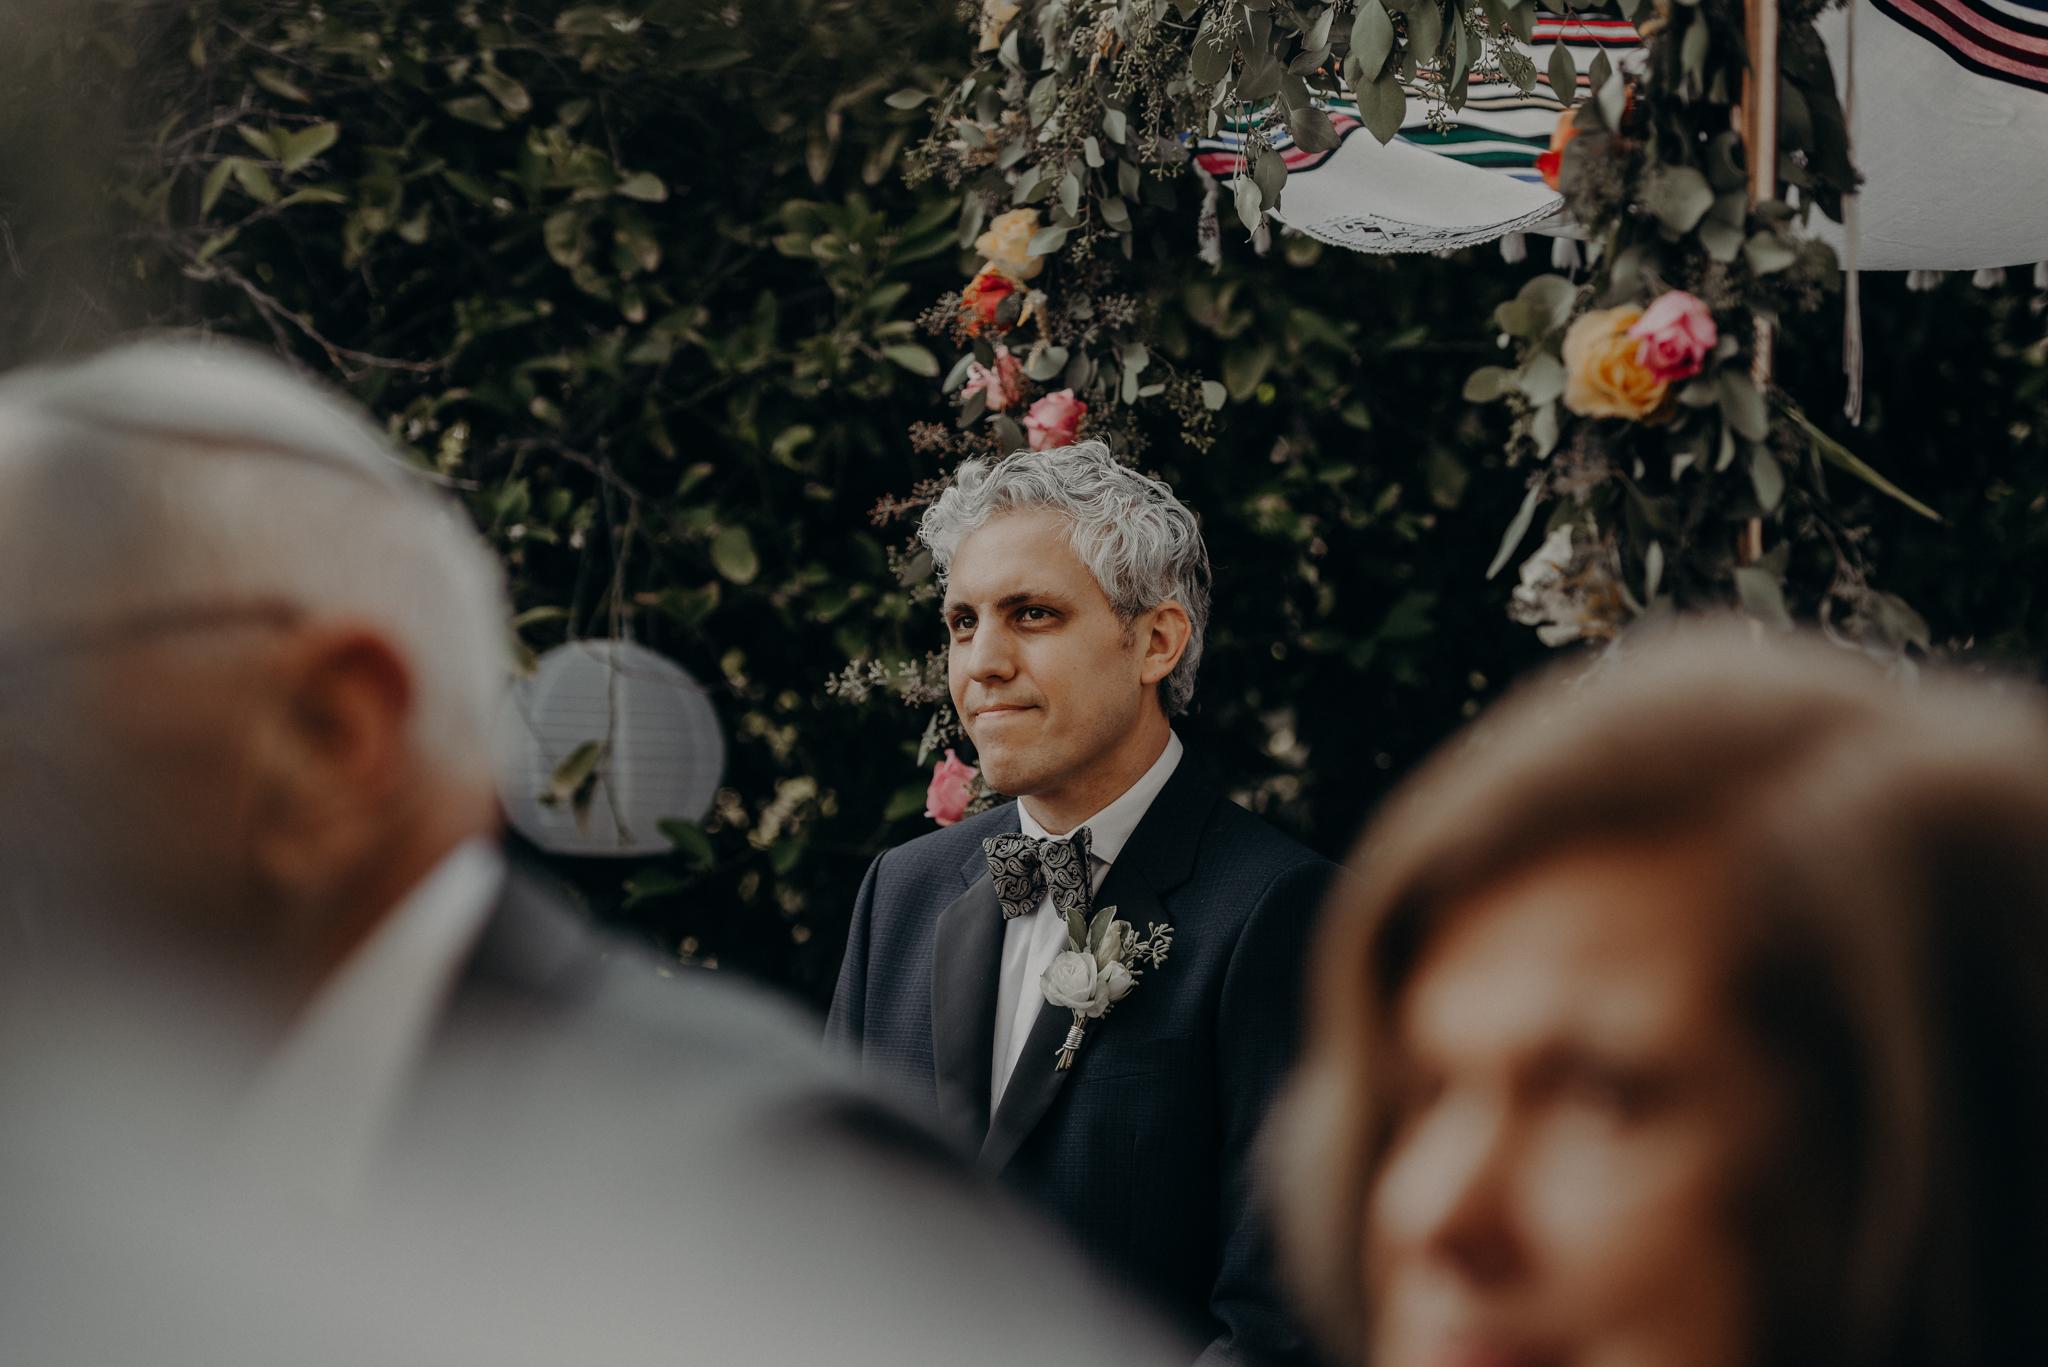 Isaiah + Taylor Photography - Private Estate Backyard Wedding - Beverly Hills - Los Angeles Wedding Photographer - 68.jpg